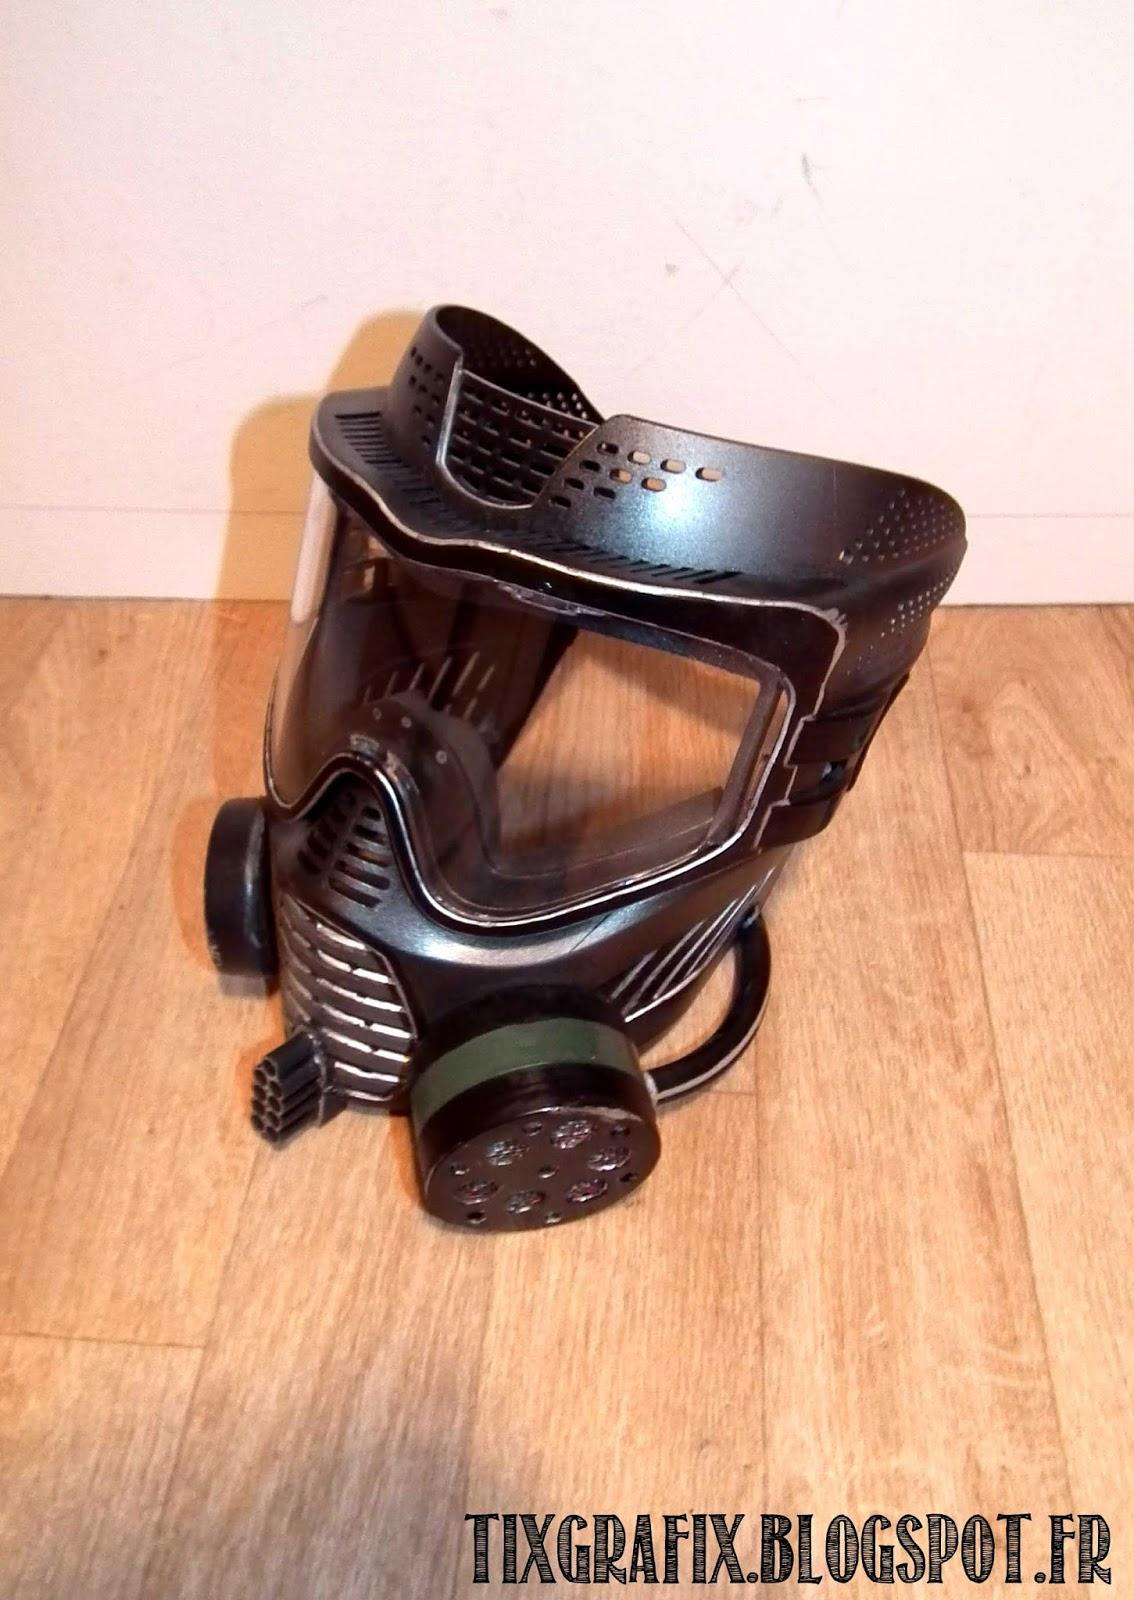 tix grafix paintball airsoft mask gaz. Black Bedroom Furniture Sets. Home Design Ideas